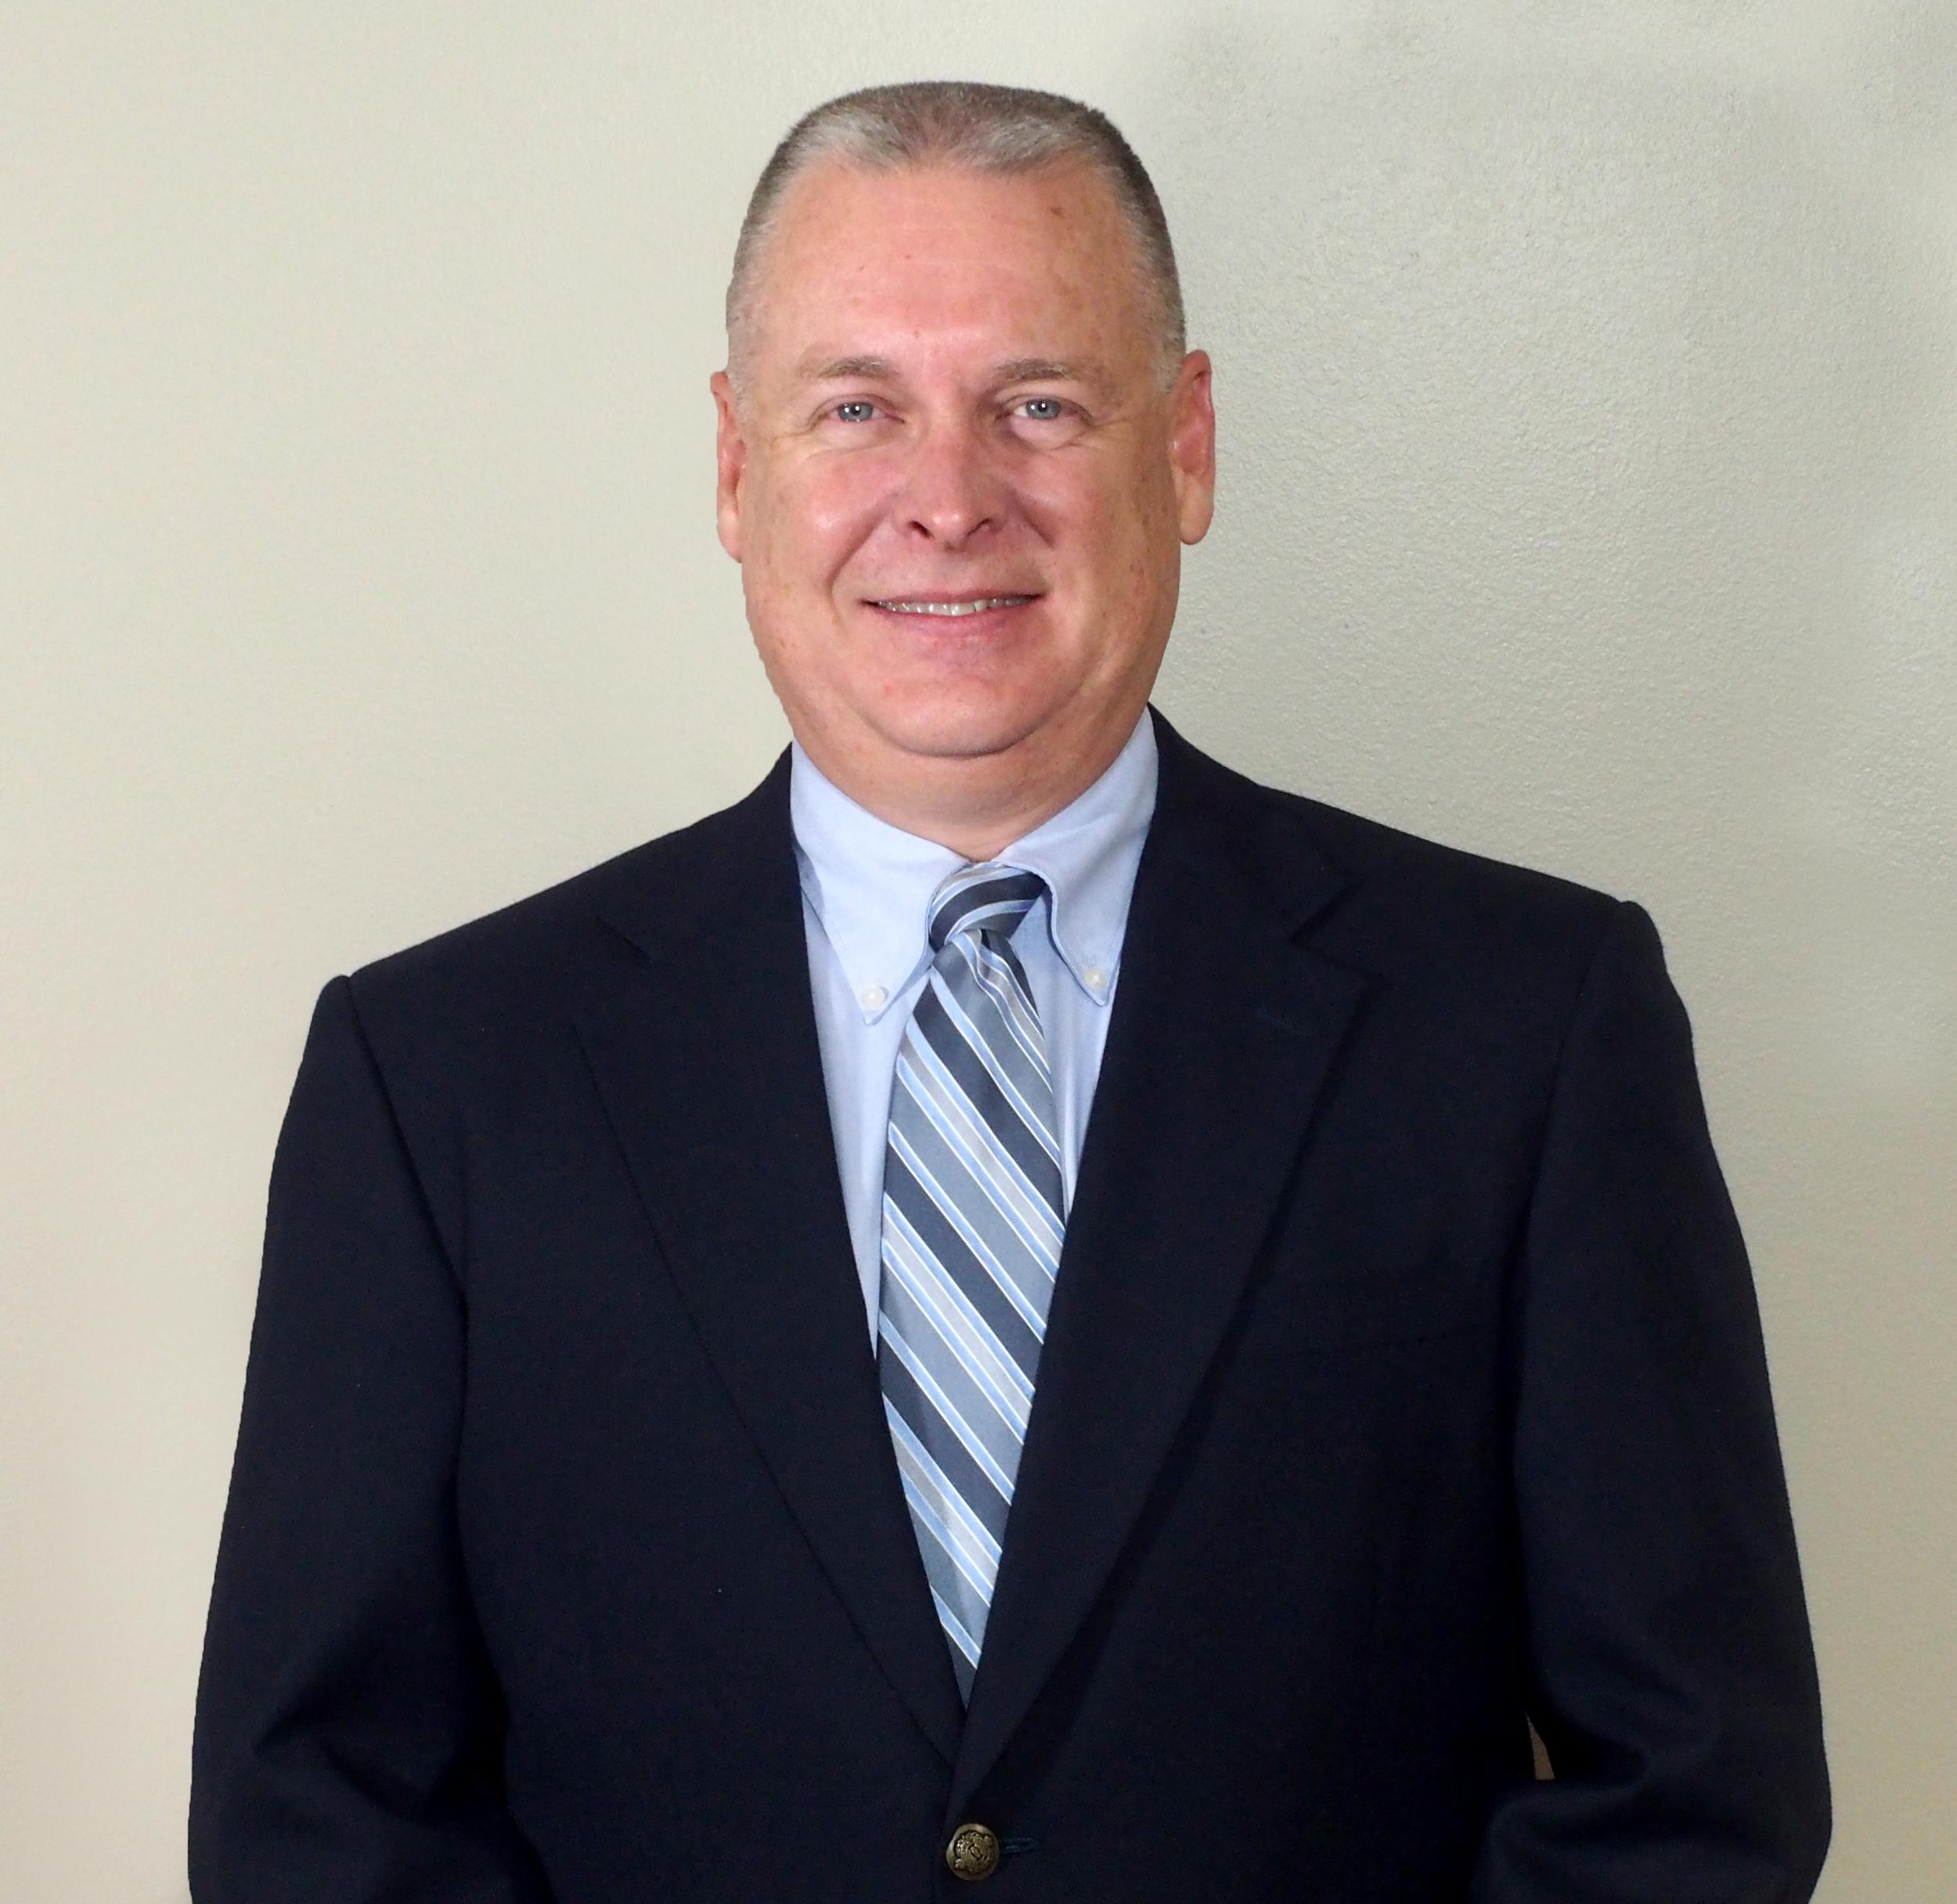 Doug Nichols - Territory Manager- N. Carolina/S. Carolina